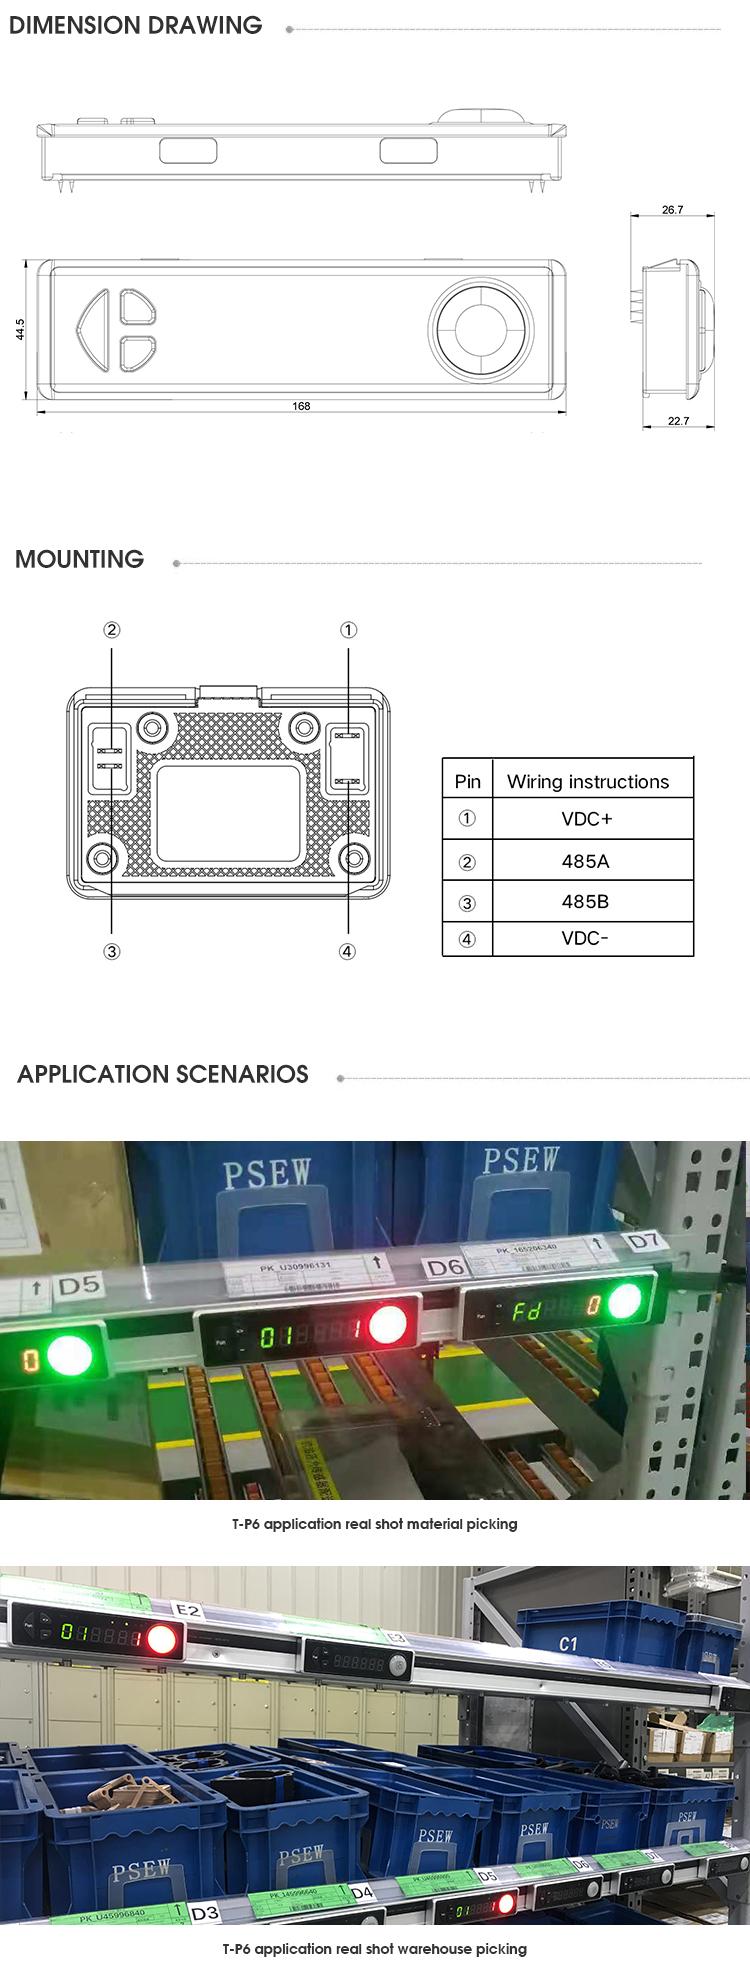 Picking to light modules